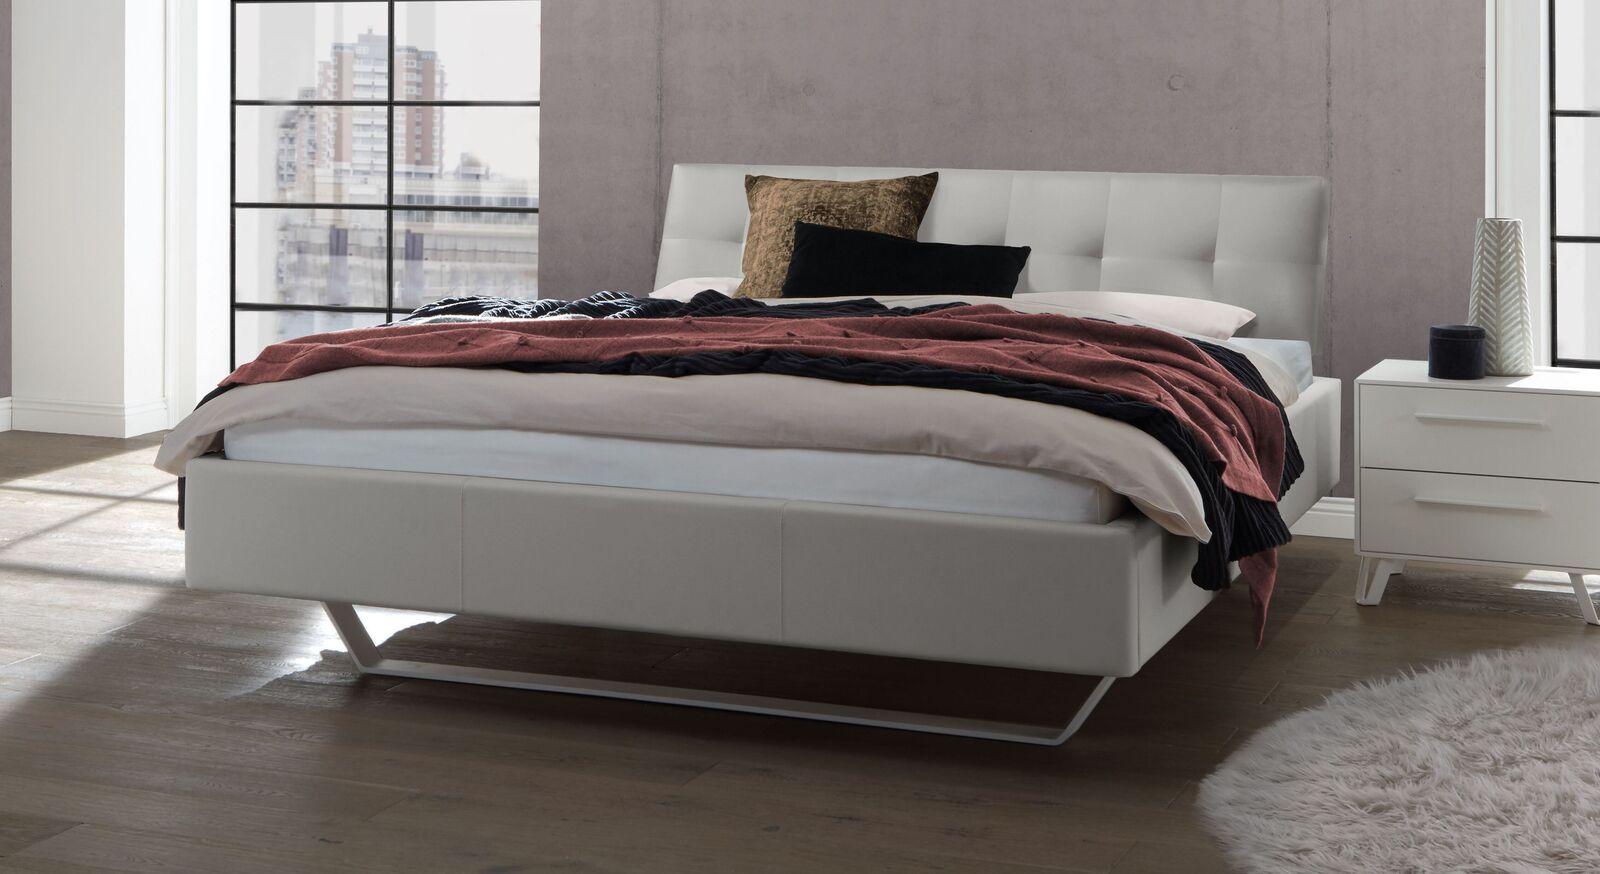 Bett Liene aus Echtleder in Hellgrau